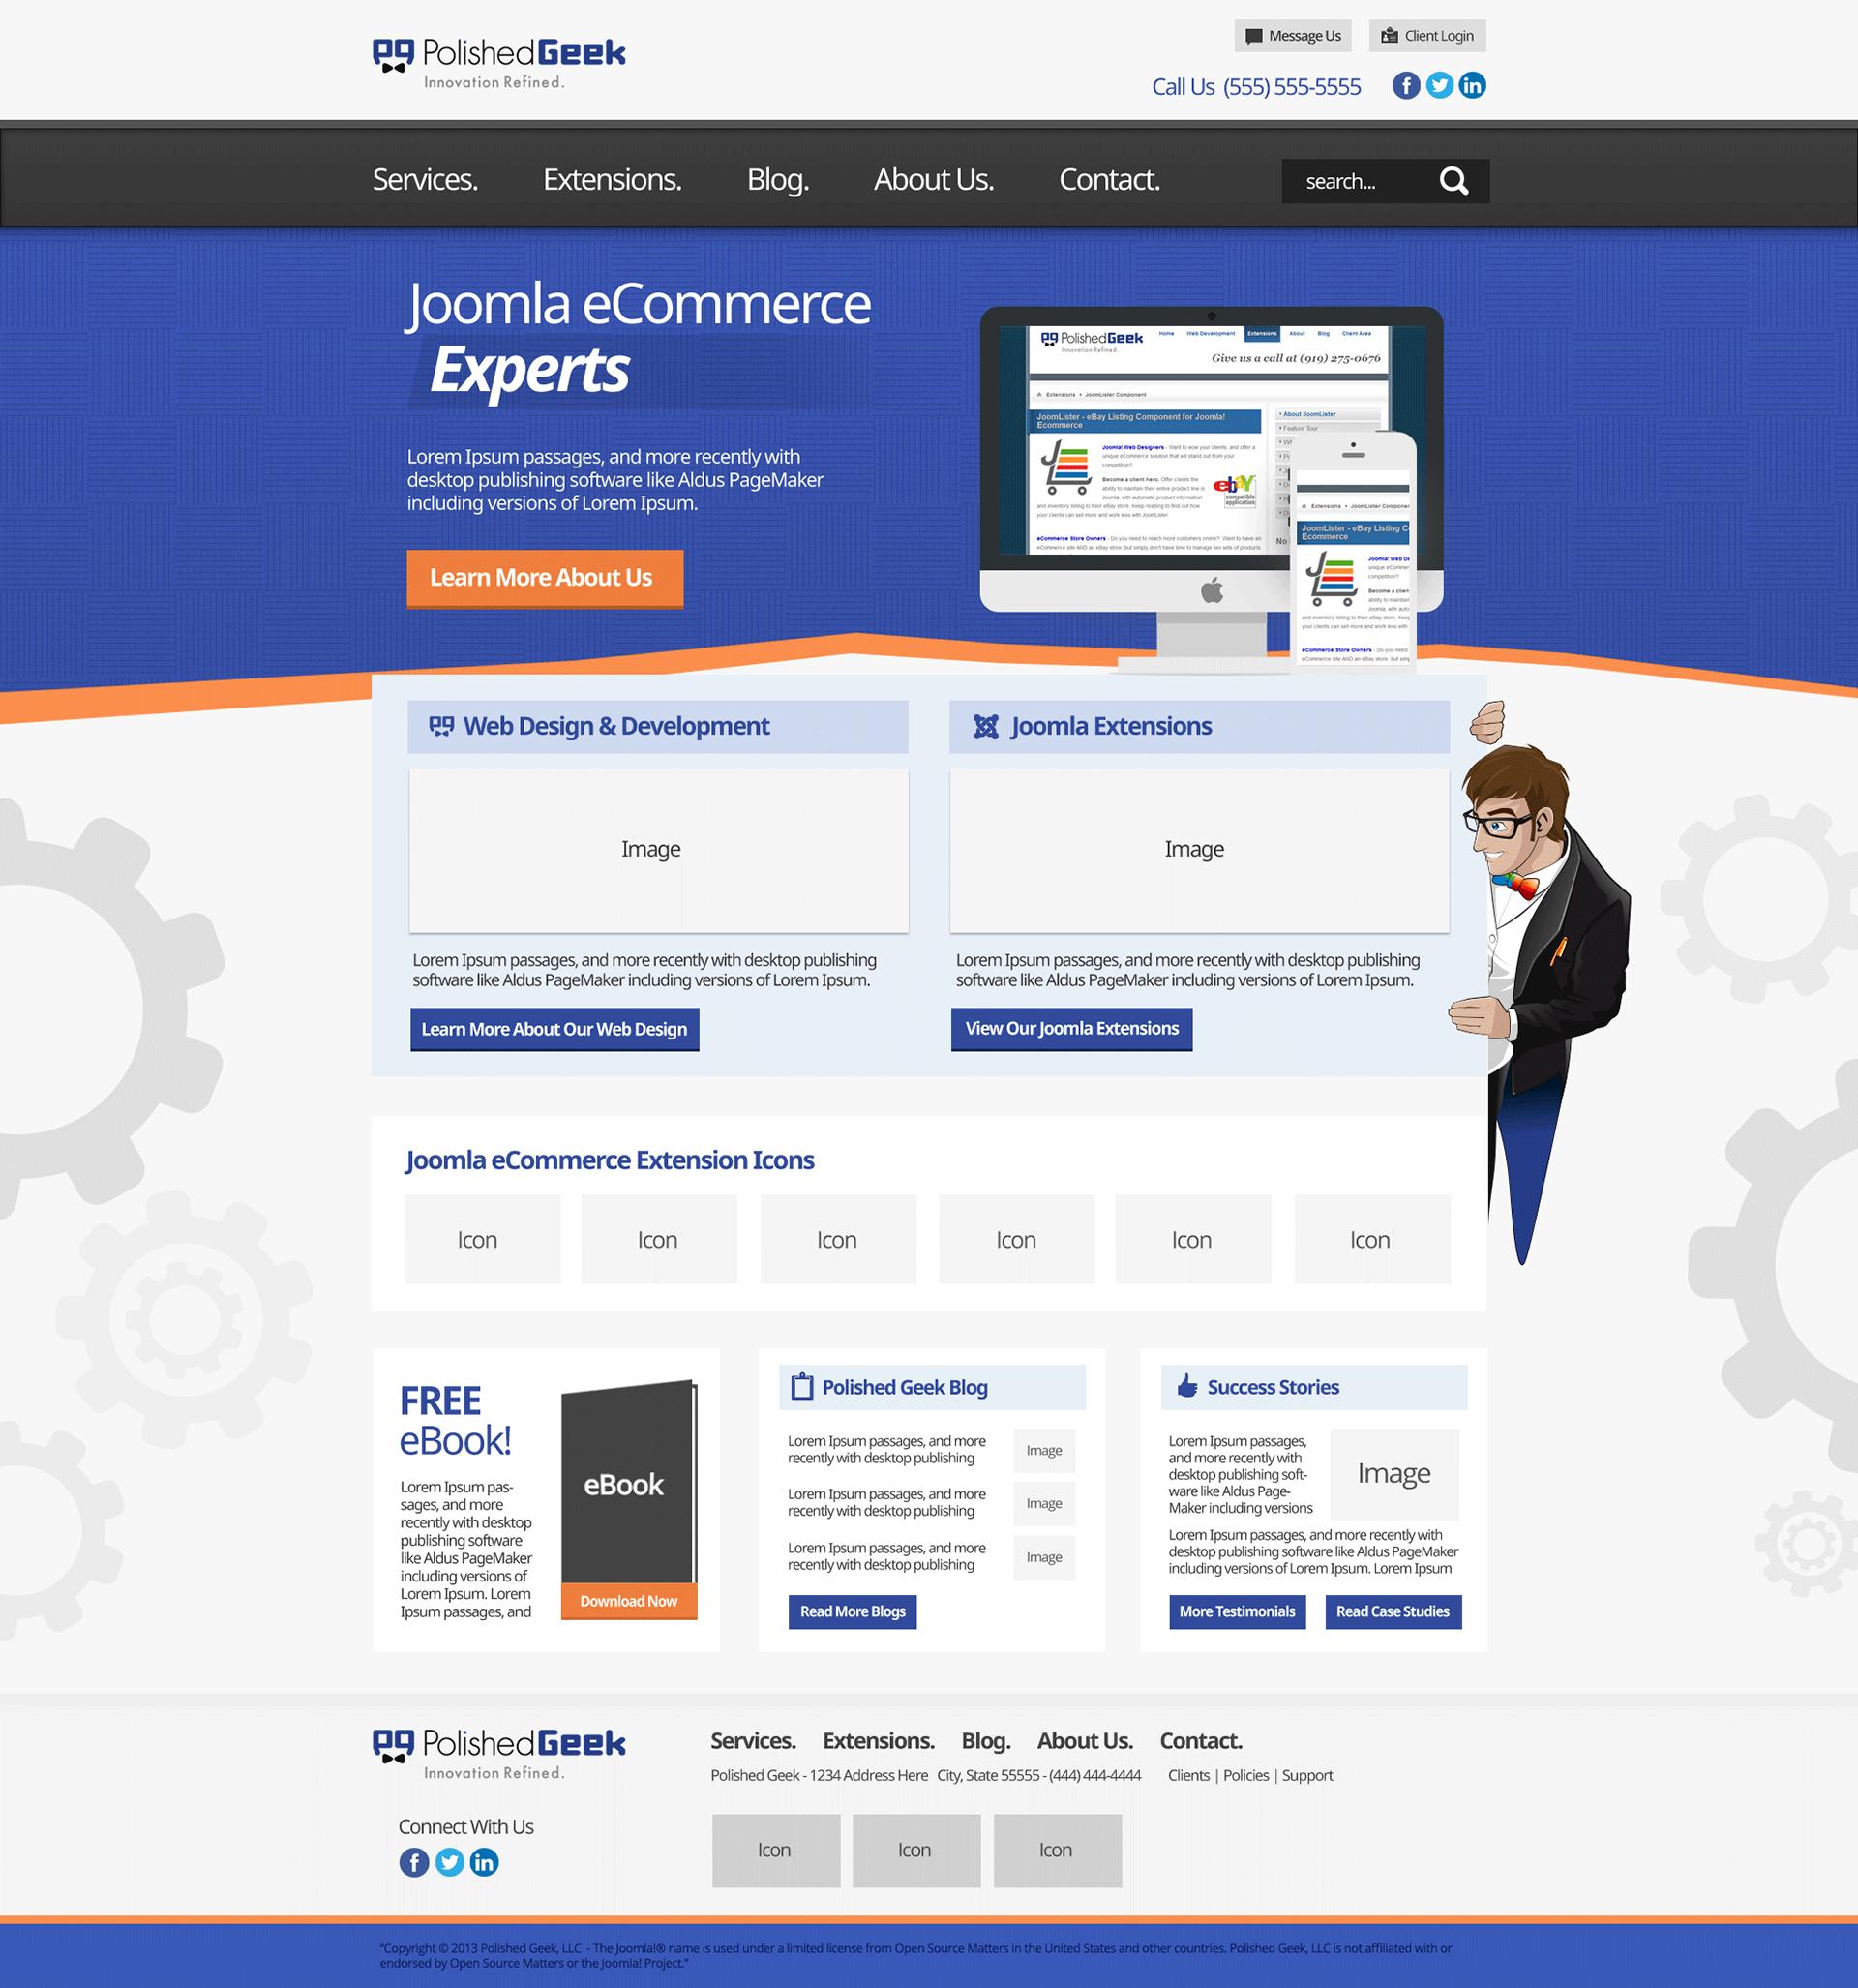 Alex Gilgenbach Graphic Designer Polished Geek Website Redesign